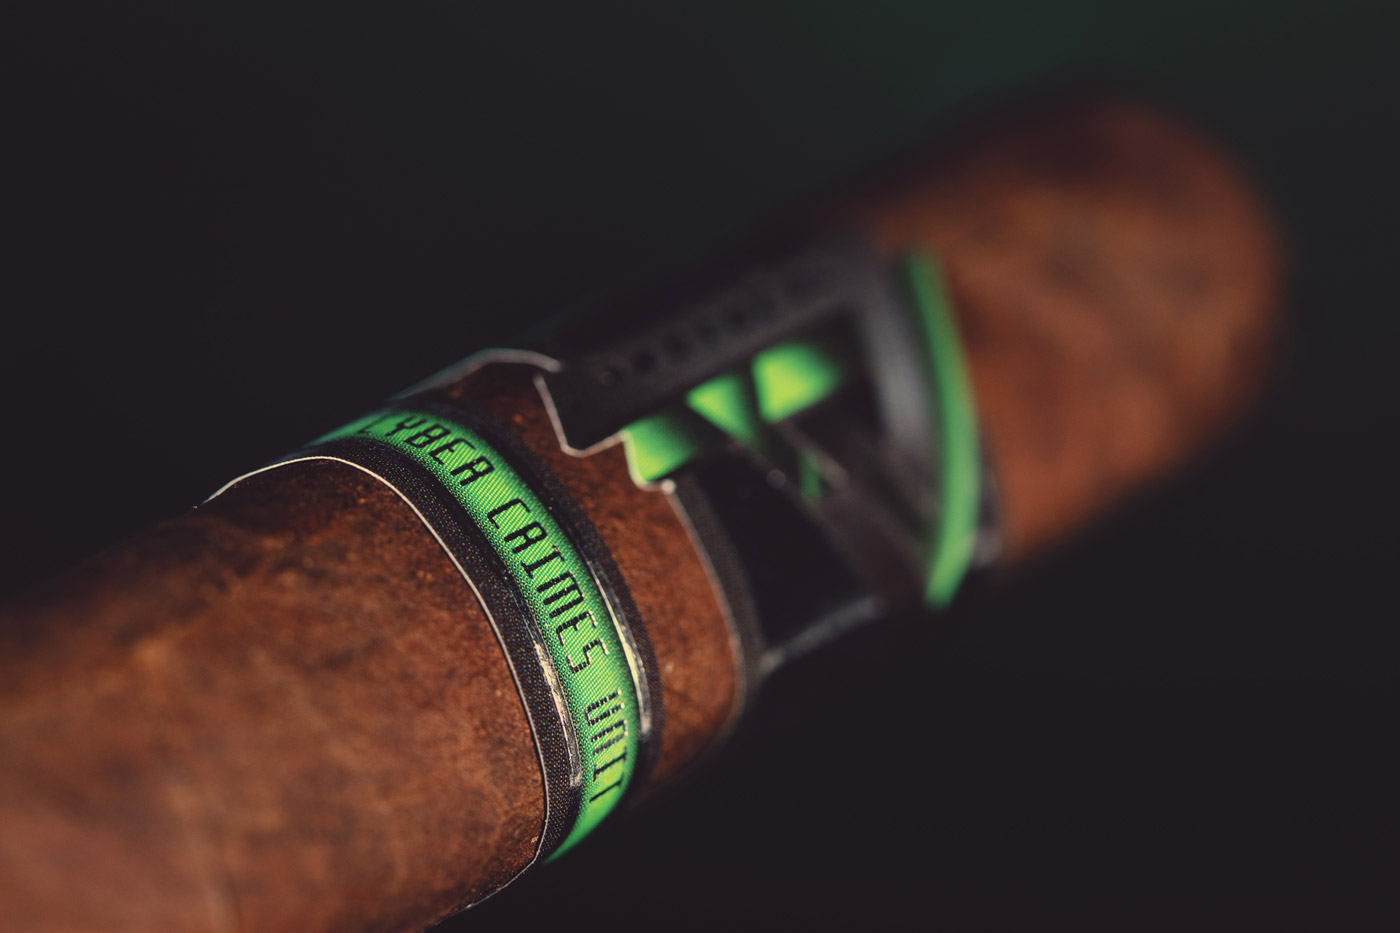 Protocol Cyber Crimes Unit Churchill cigar review